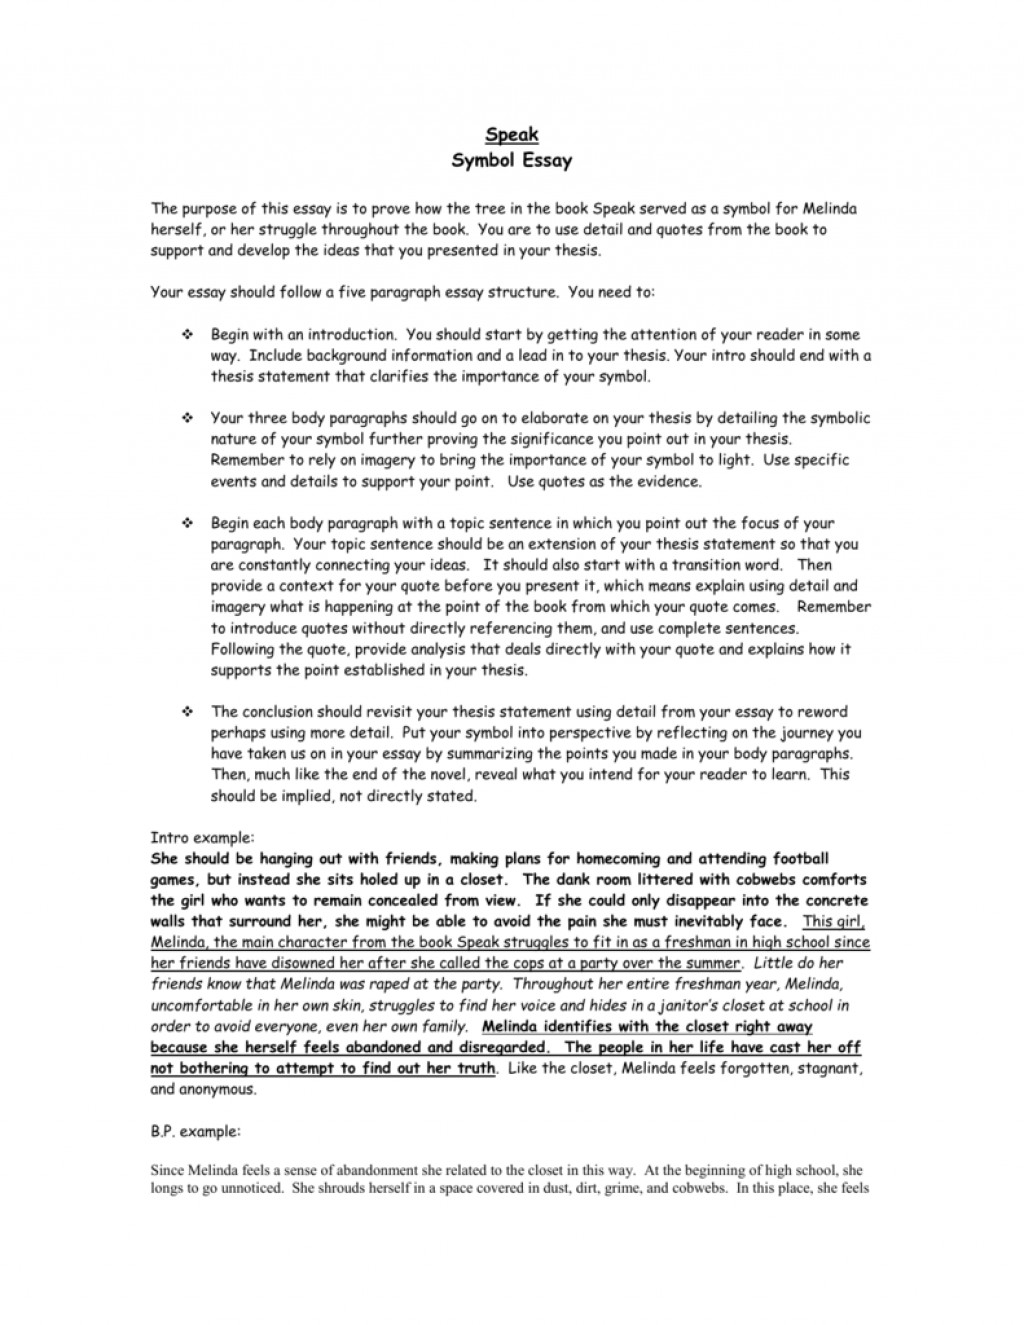 008 Essay Example Reword 008001873 1 Amazing Generator Free Large